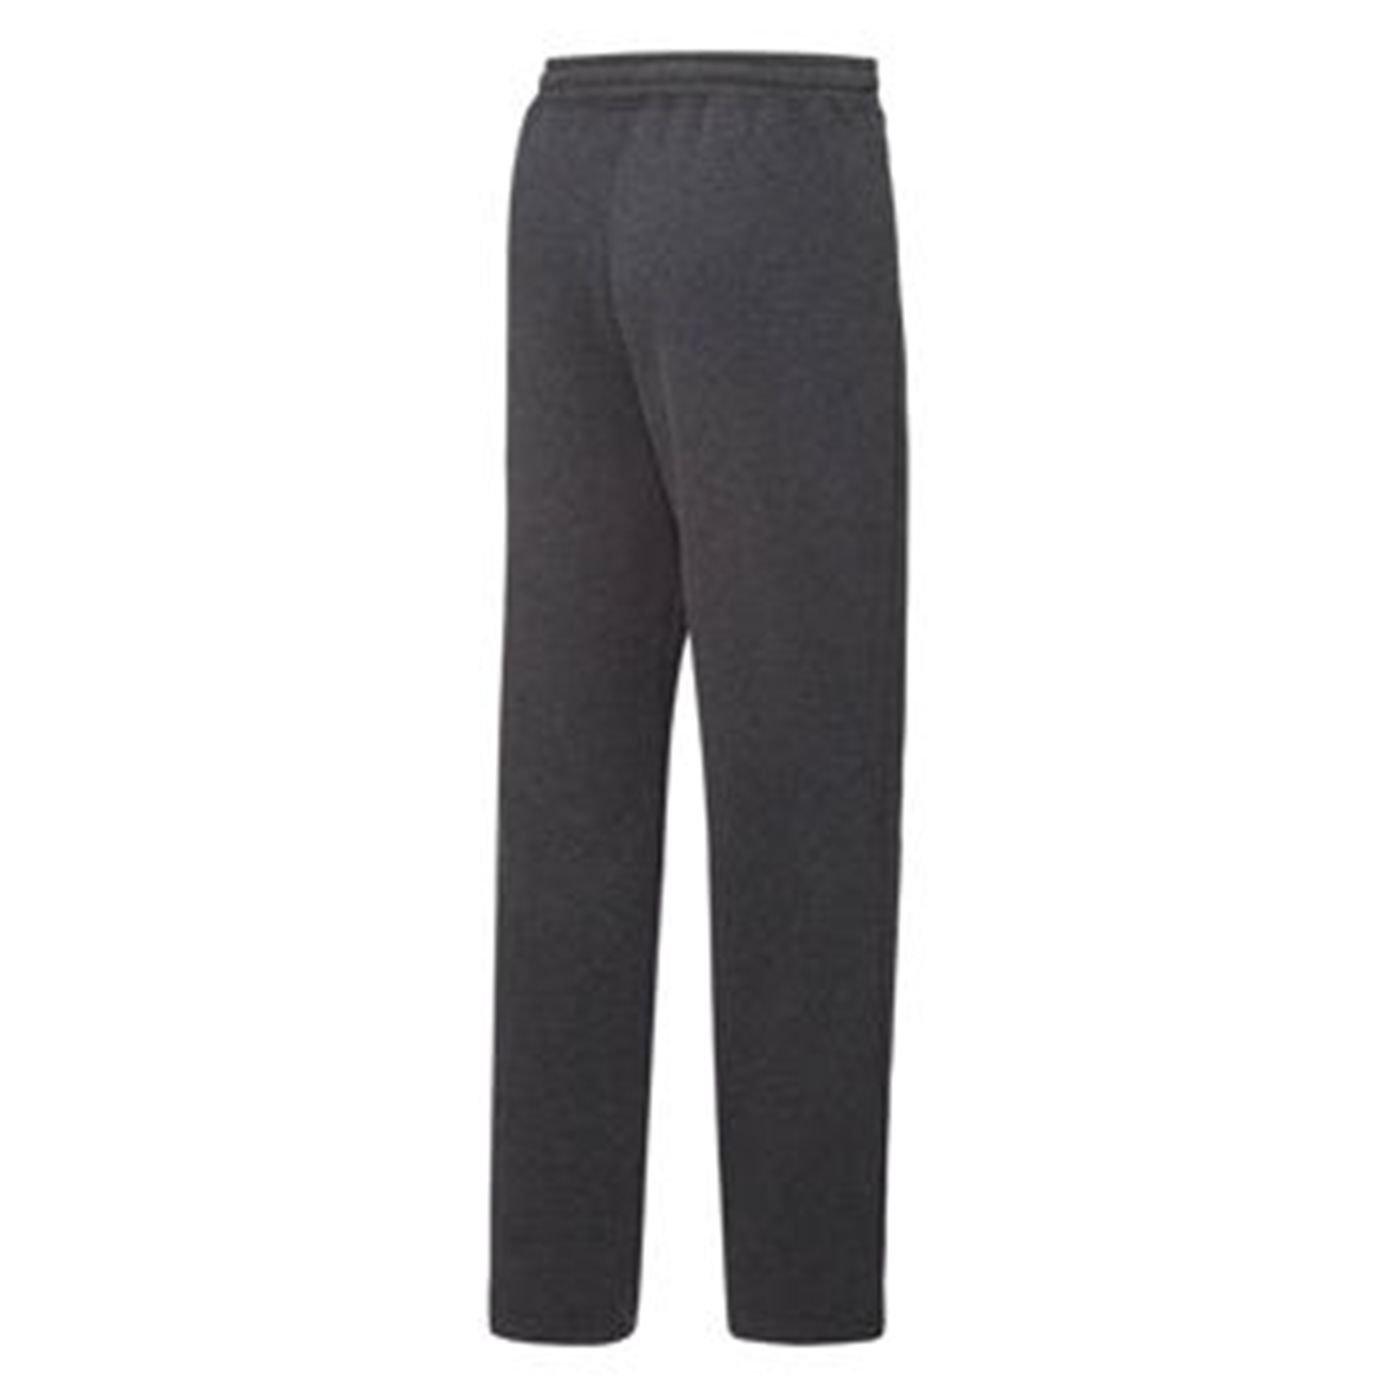 40f356cb9741 Amazon.com  Puma Men s Fleece Pant-Dark Gray